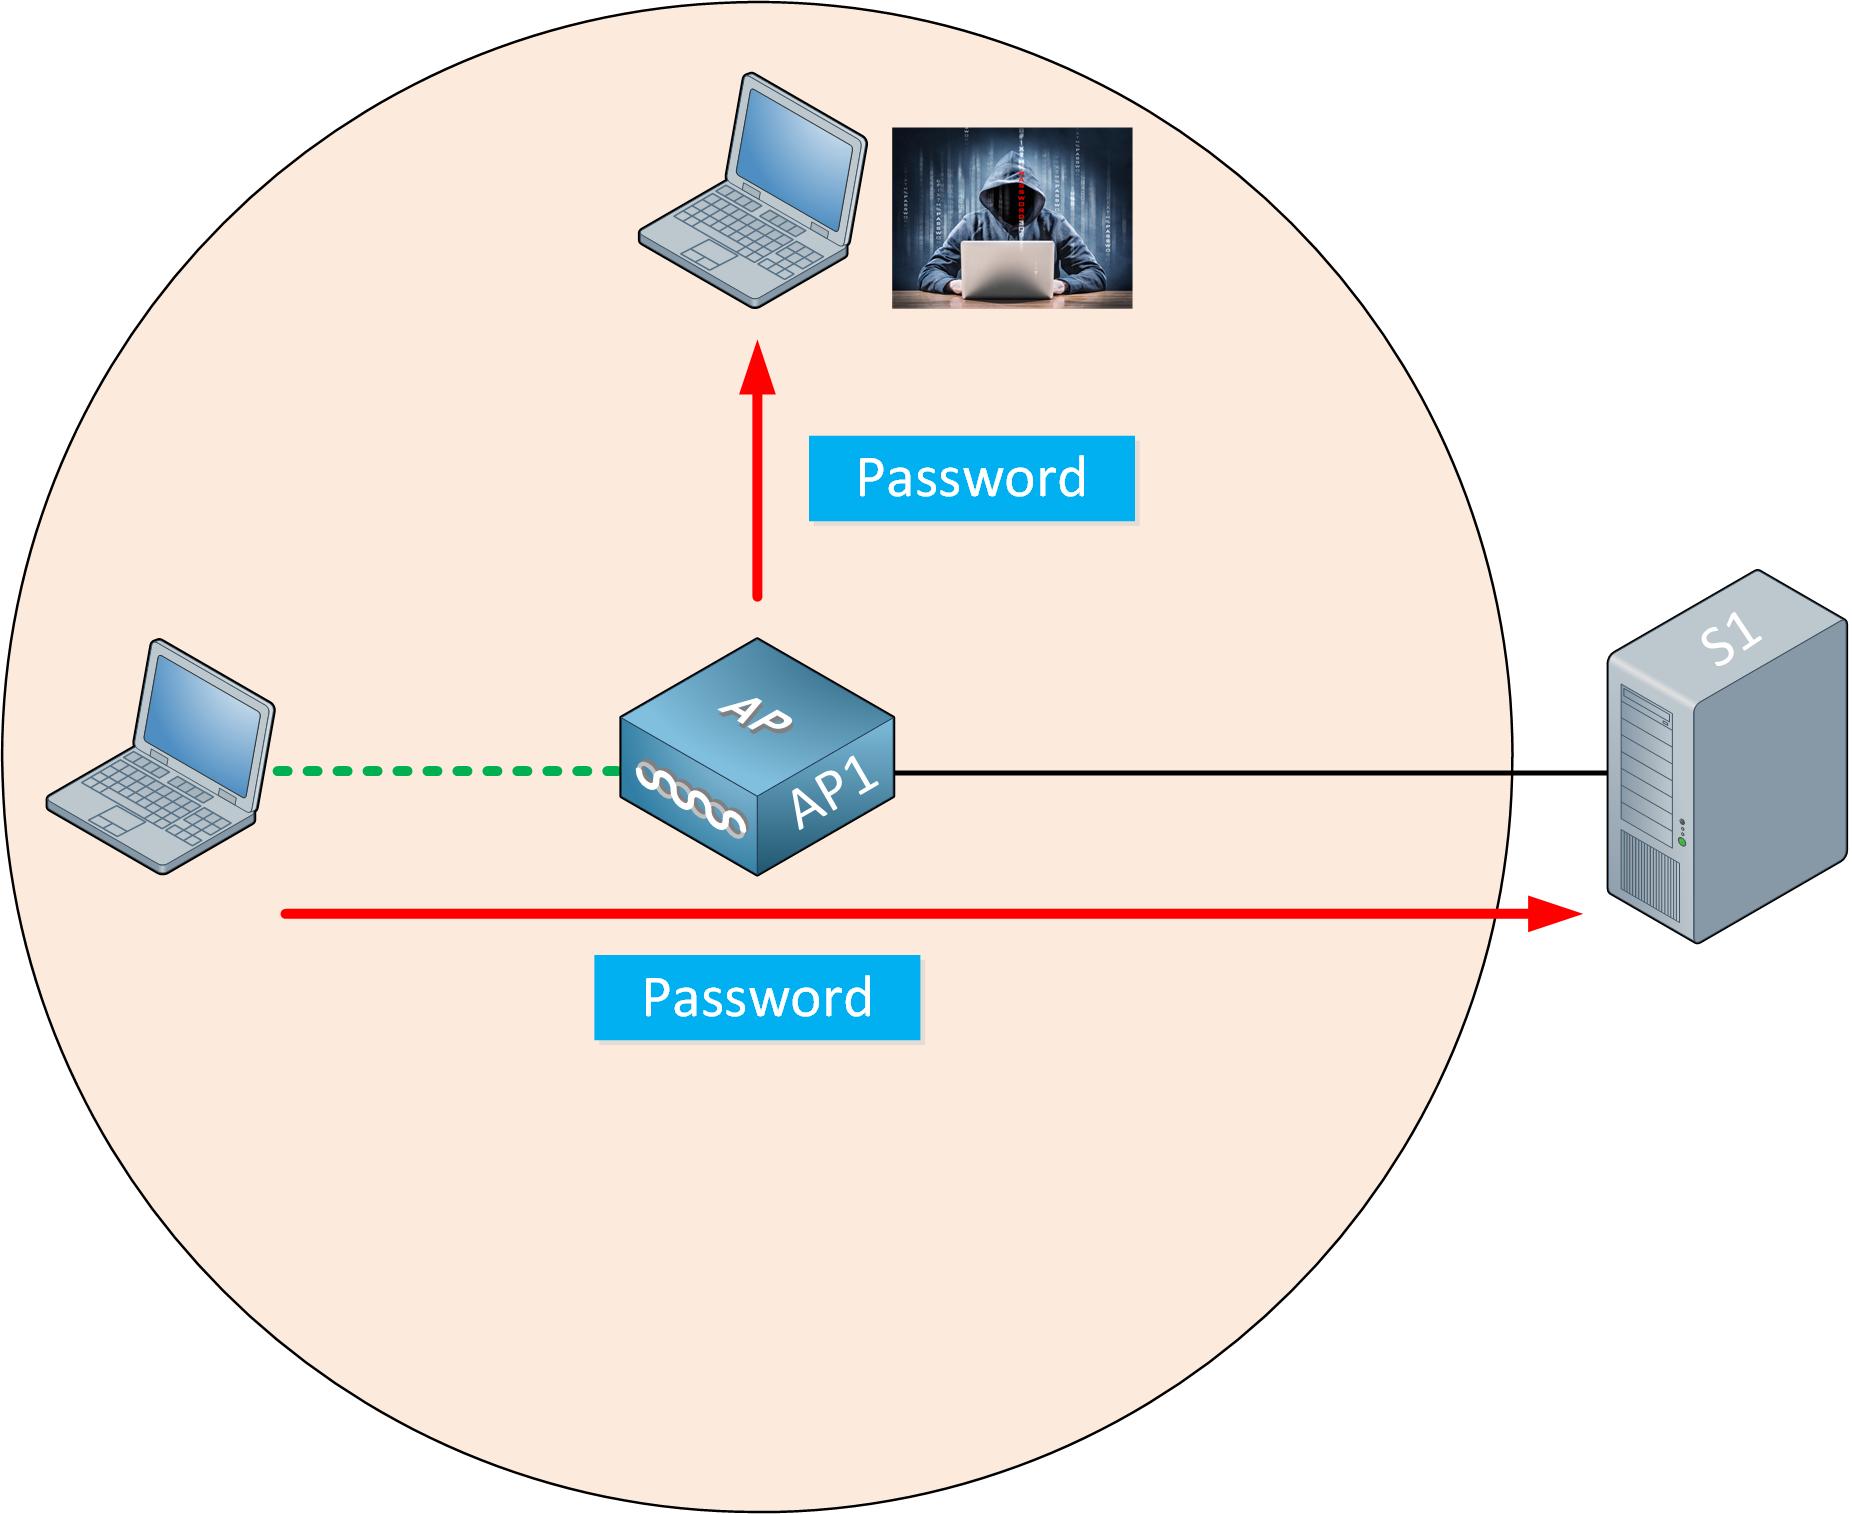 Wireless Attacker Captures Password